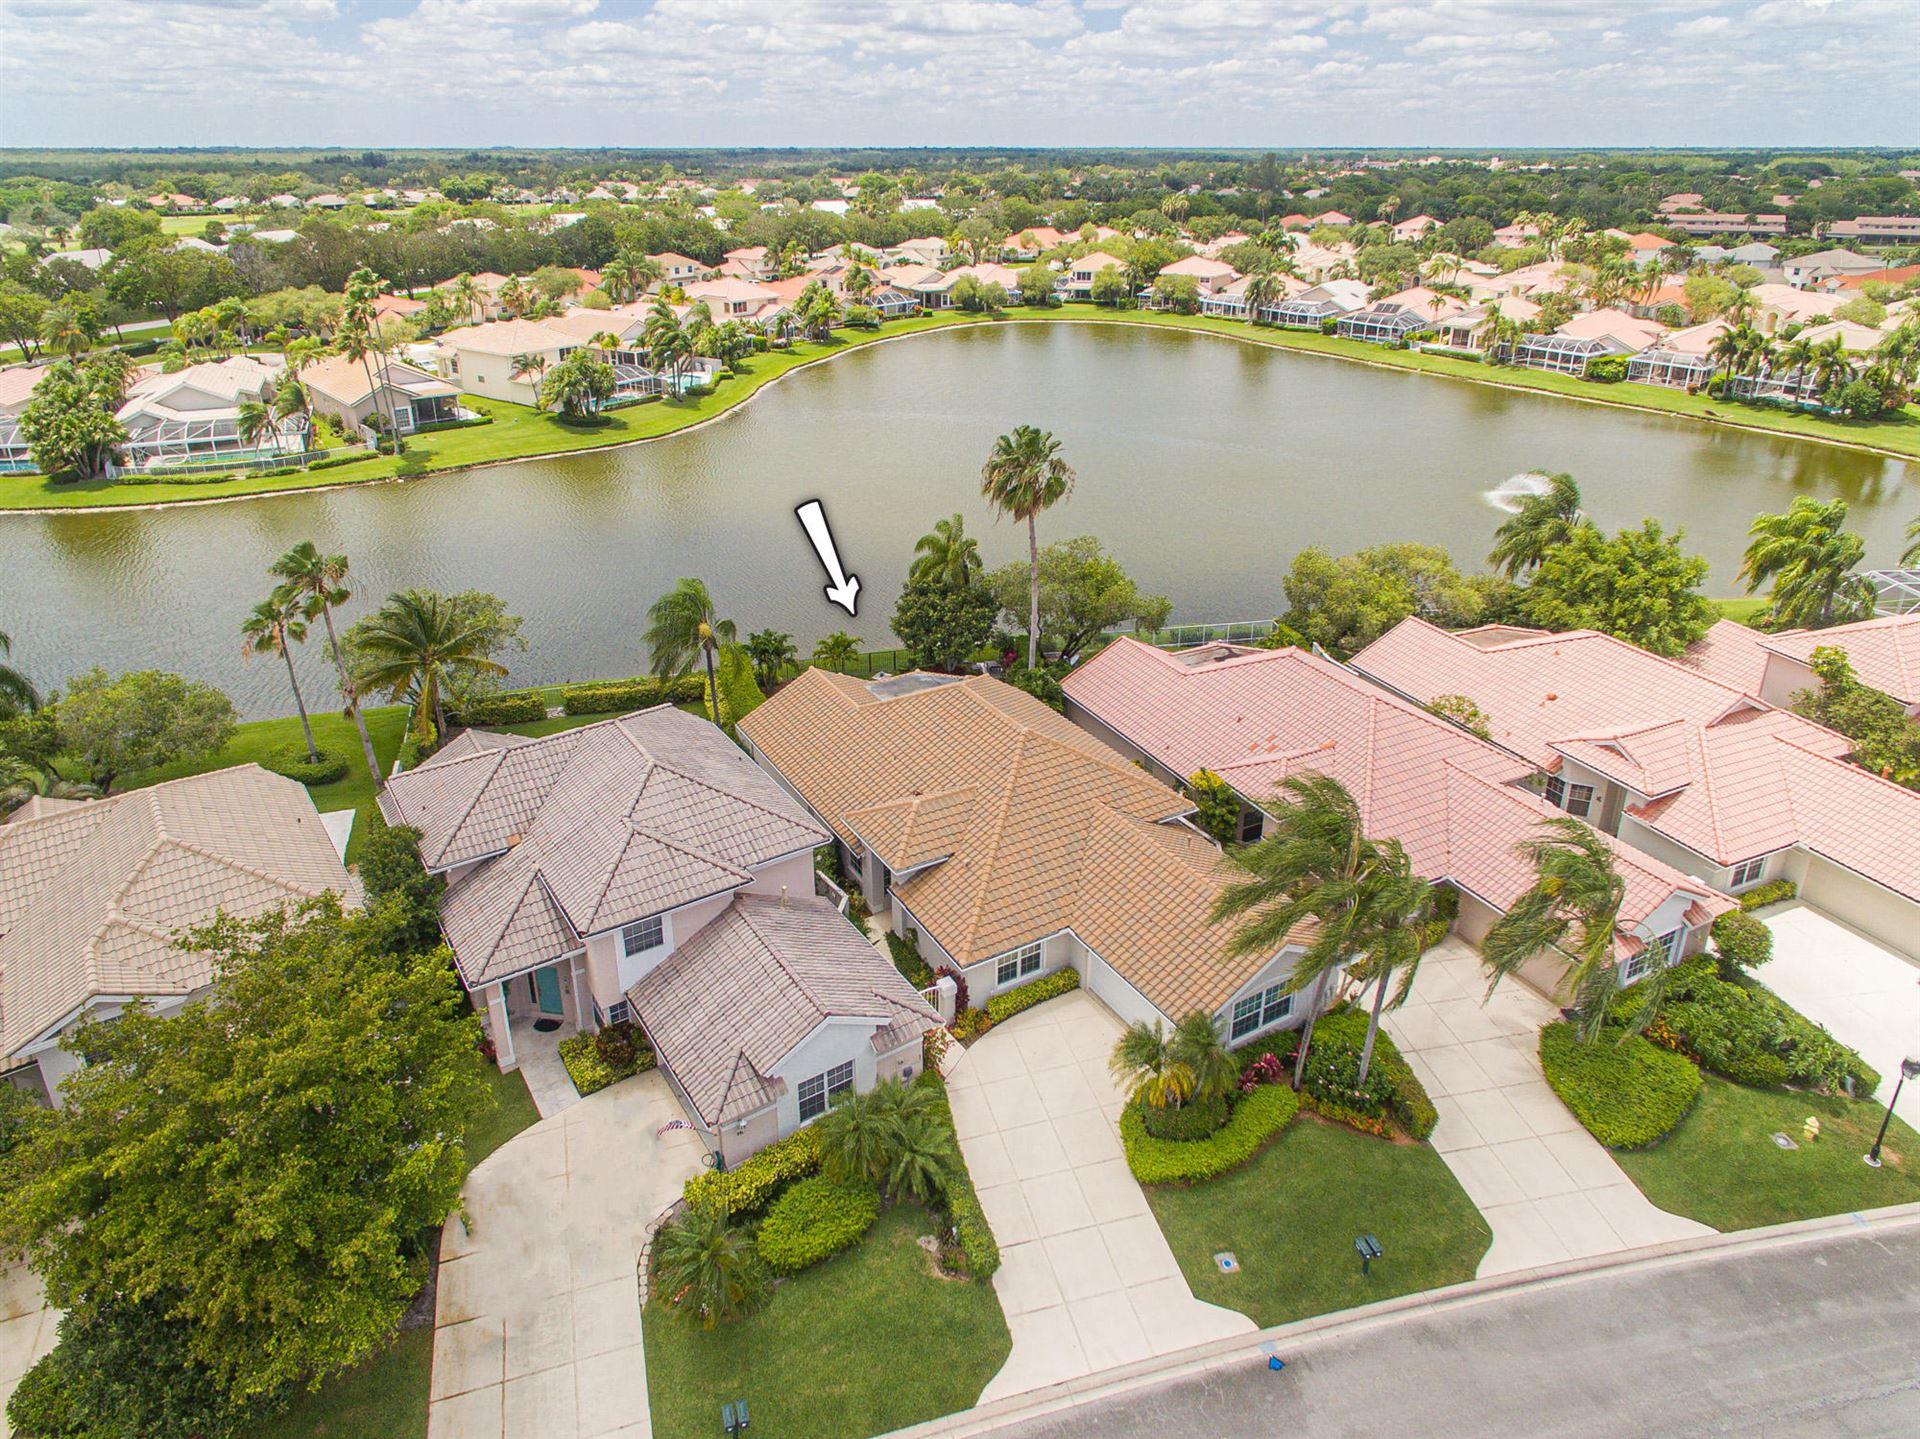 Photo of 114 Eagleton Lane, Palm Beach Gardens, FL 33418 (MLS # RX-10621844)